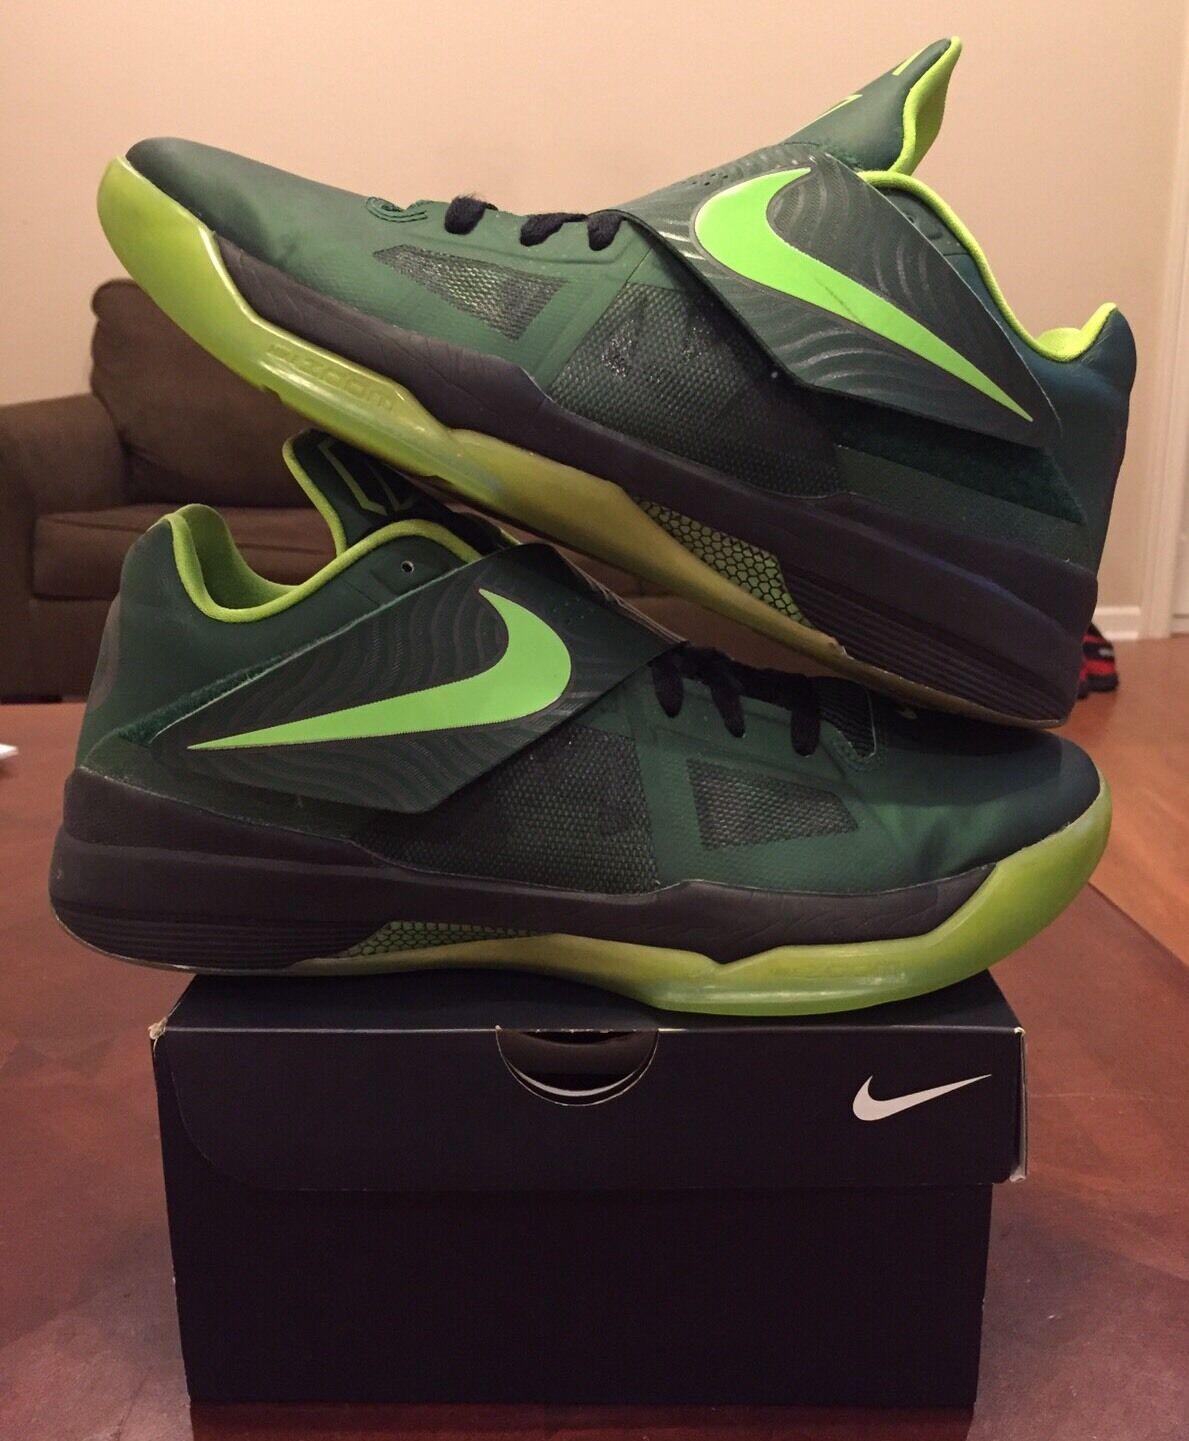 Nike KD 4 IV id oscuro Hulk verde oscuro id Cal Nerf 9 Jordan Yeezy BHM Pearl 6 7 8 Galaxy marca de descuento 7c01f7